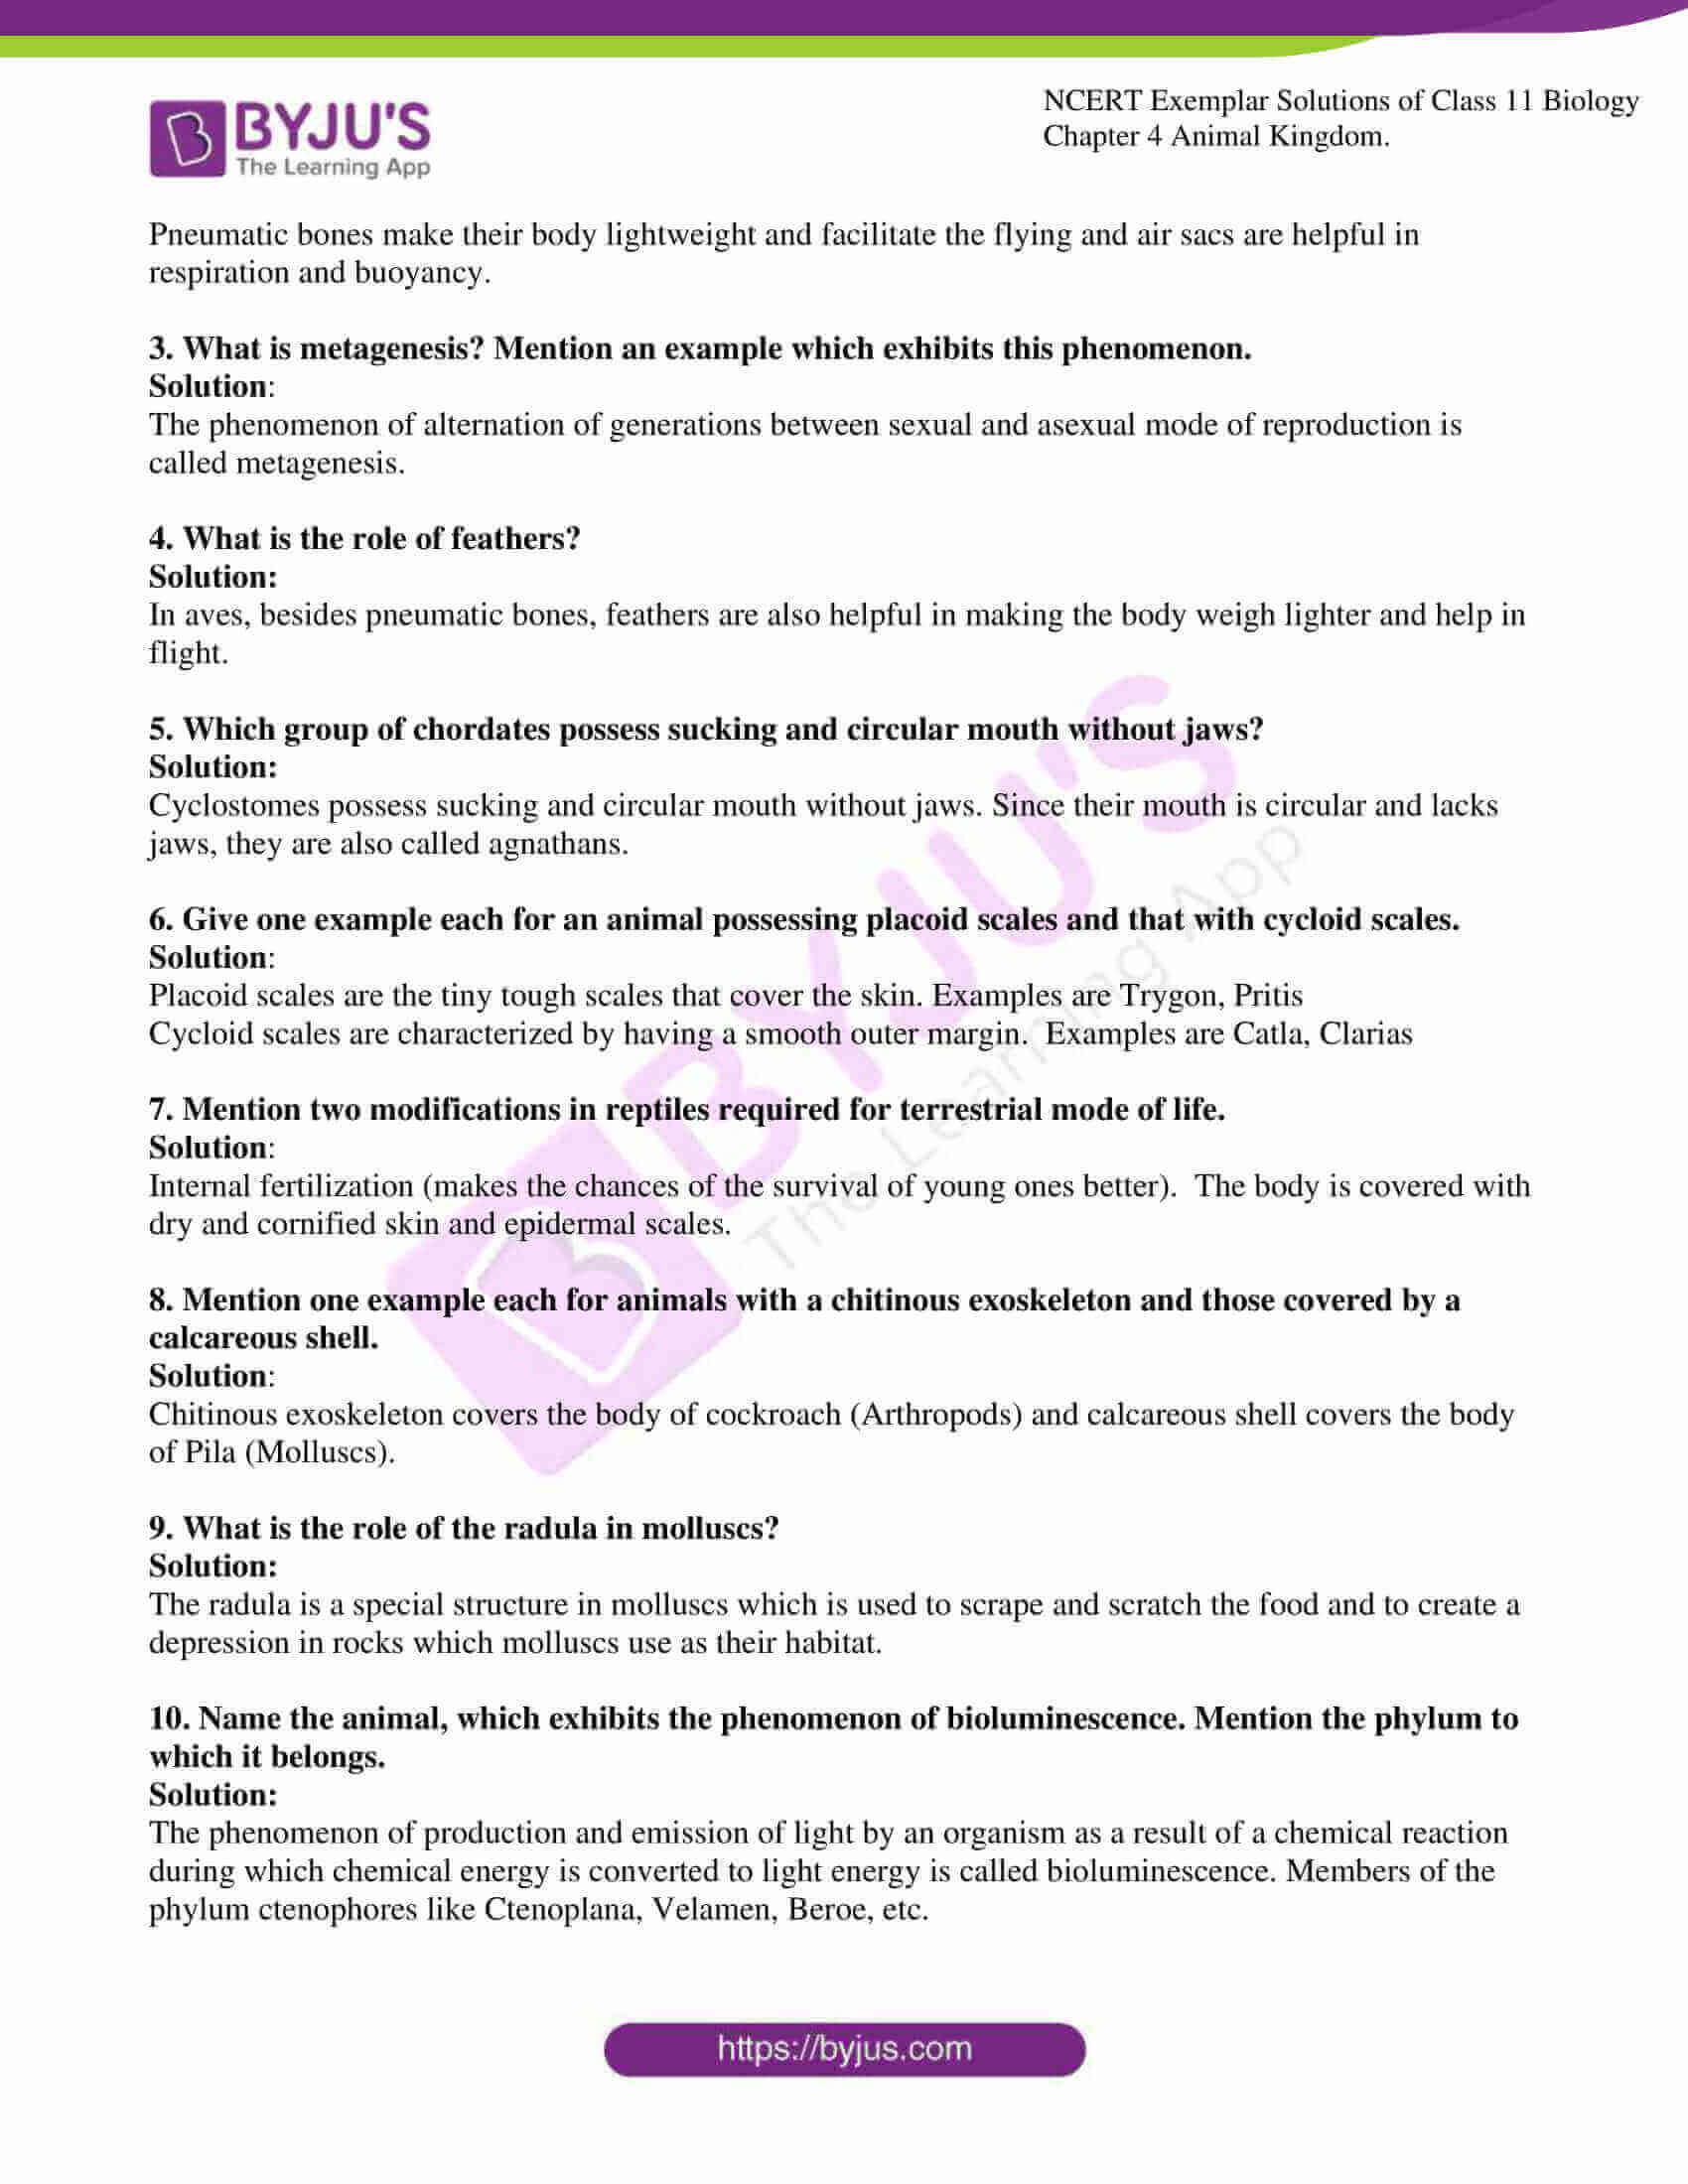 ncert exemplar solutions for class 11 bio chapter 4 04